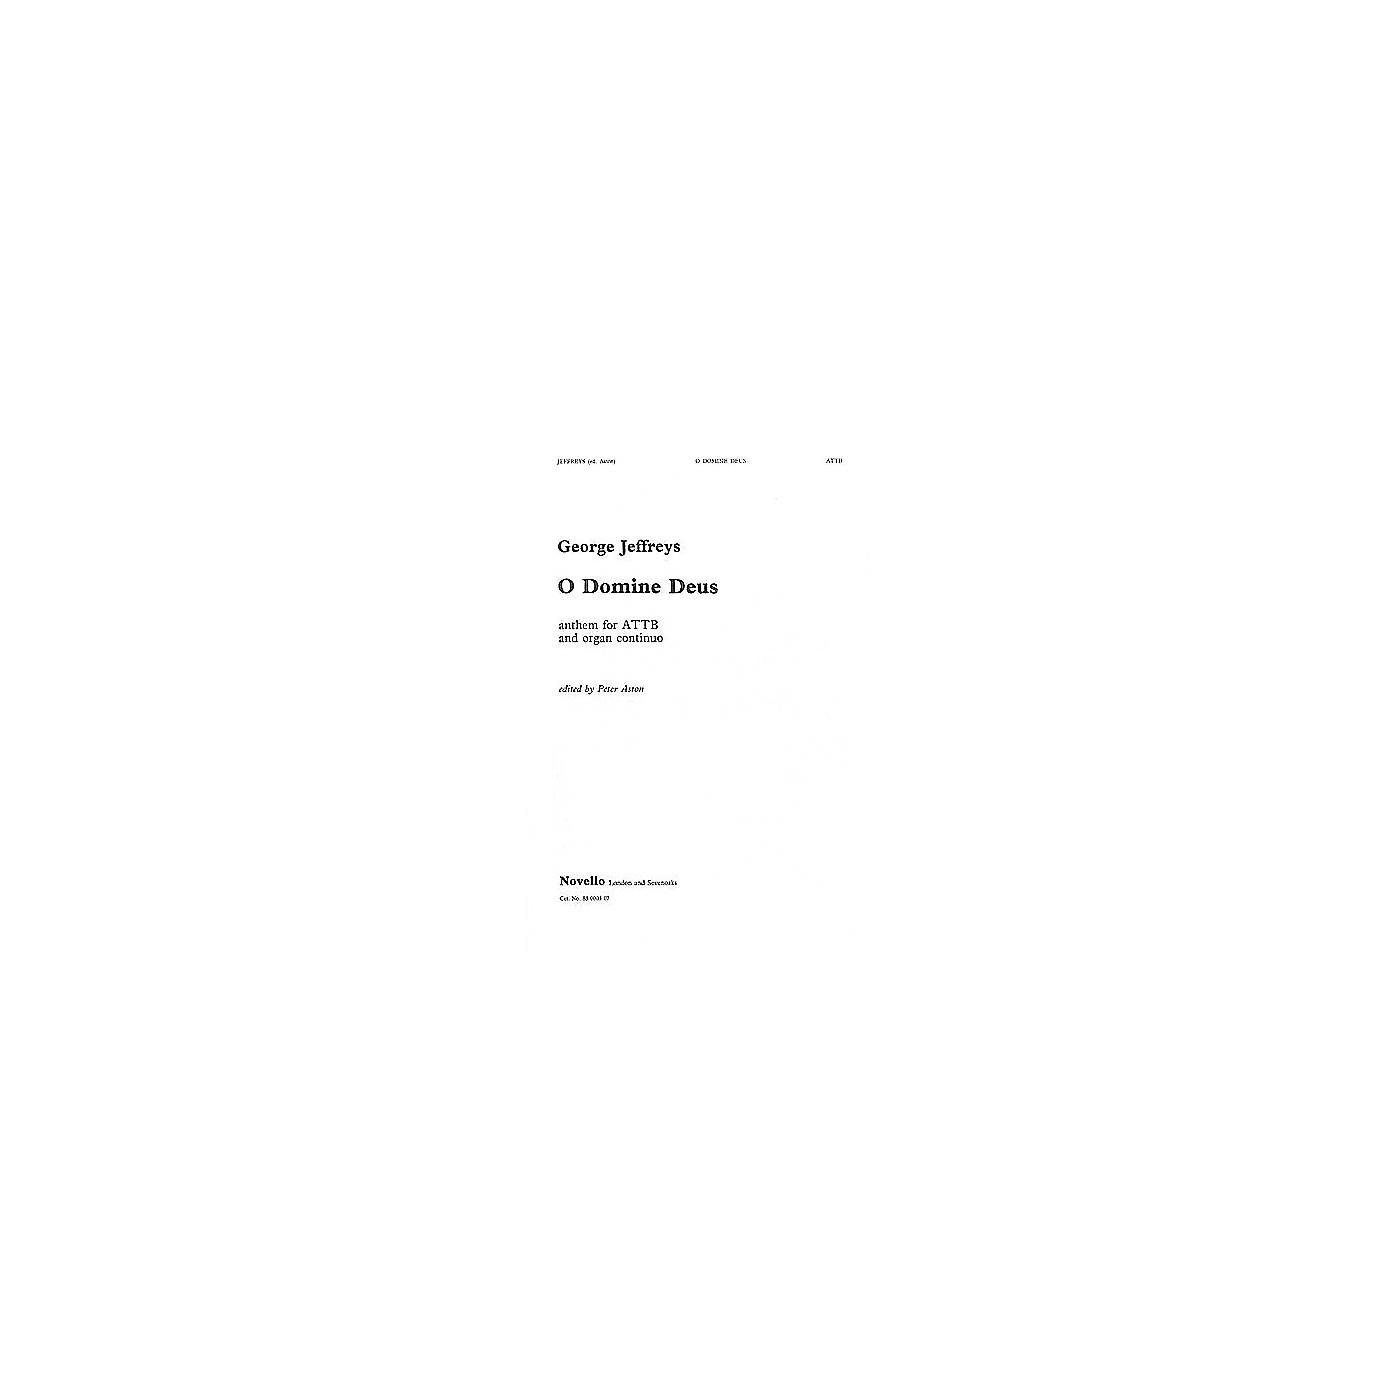 Novello O Domine Deus/O Deus Meus CHORAL SCORE Composed by George Jeffreys Edited by Peter Aston thumbnail